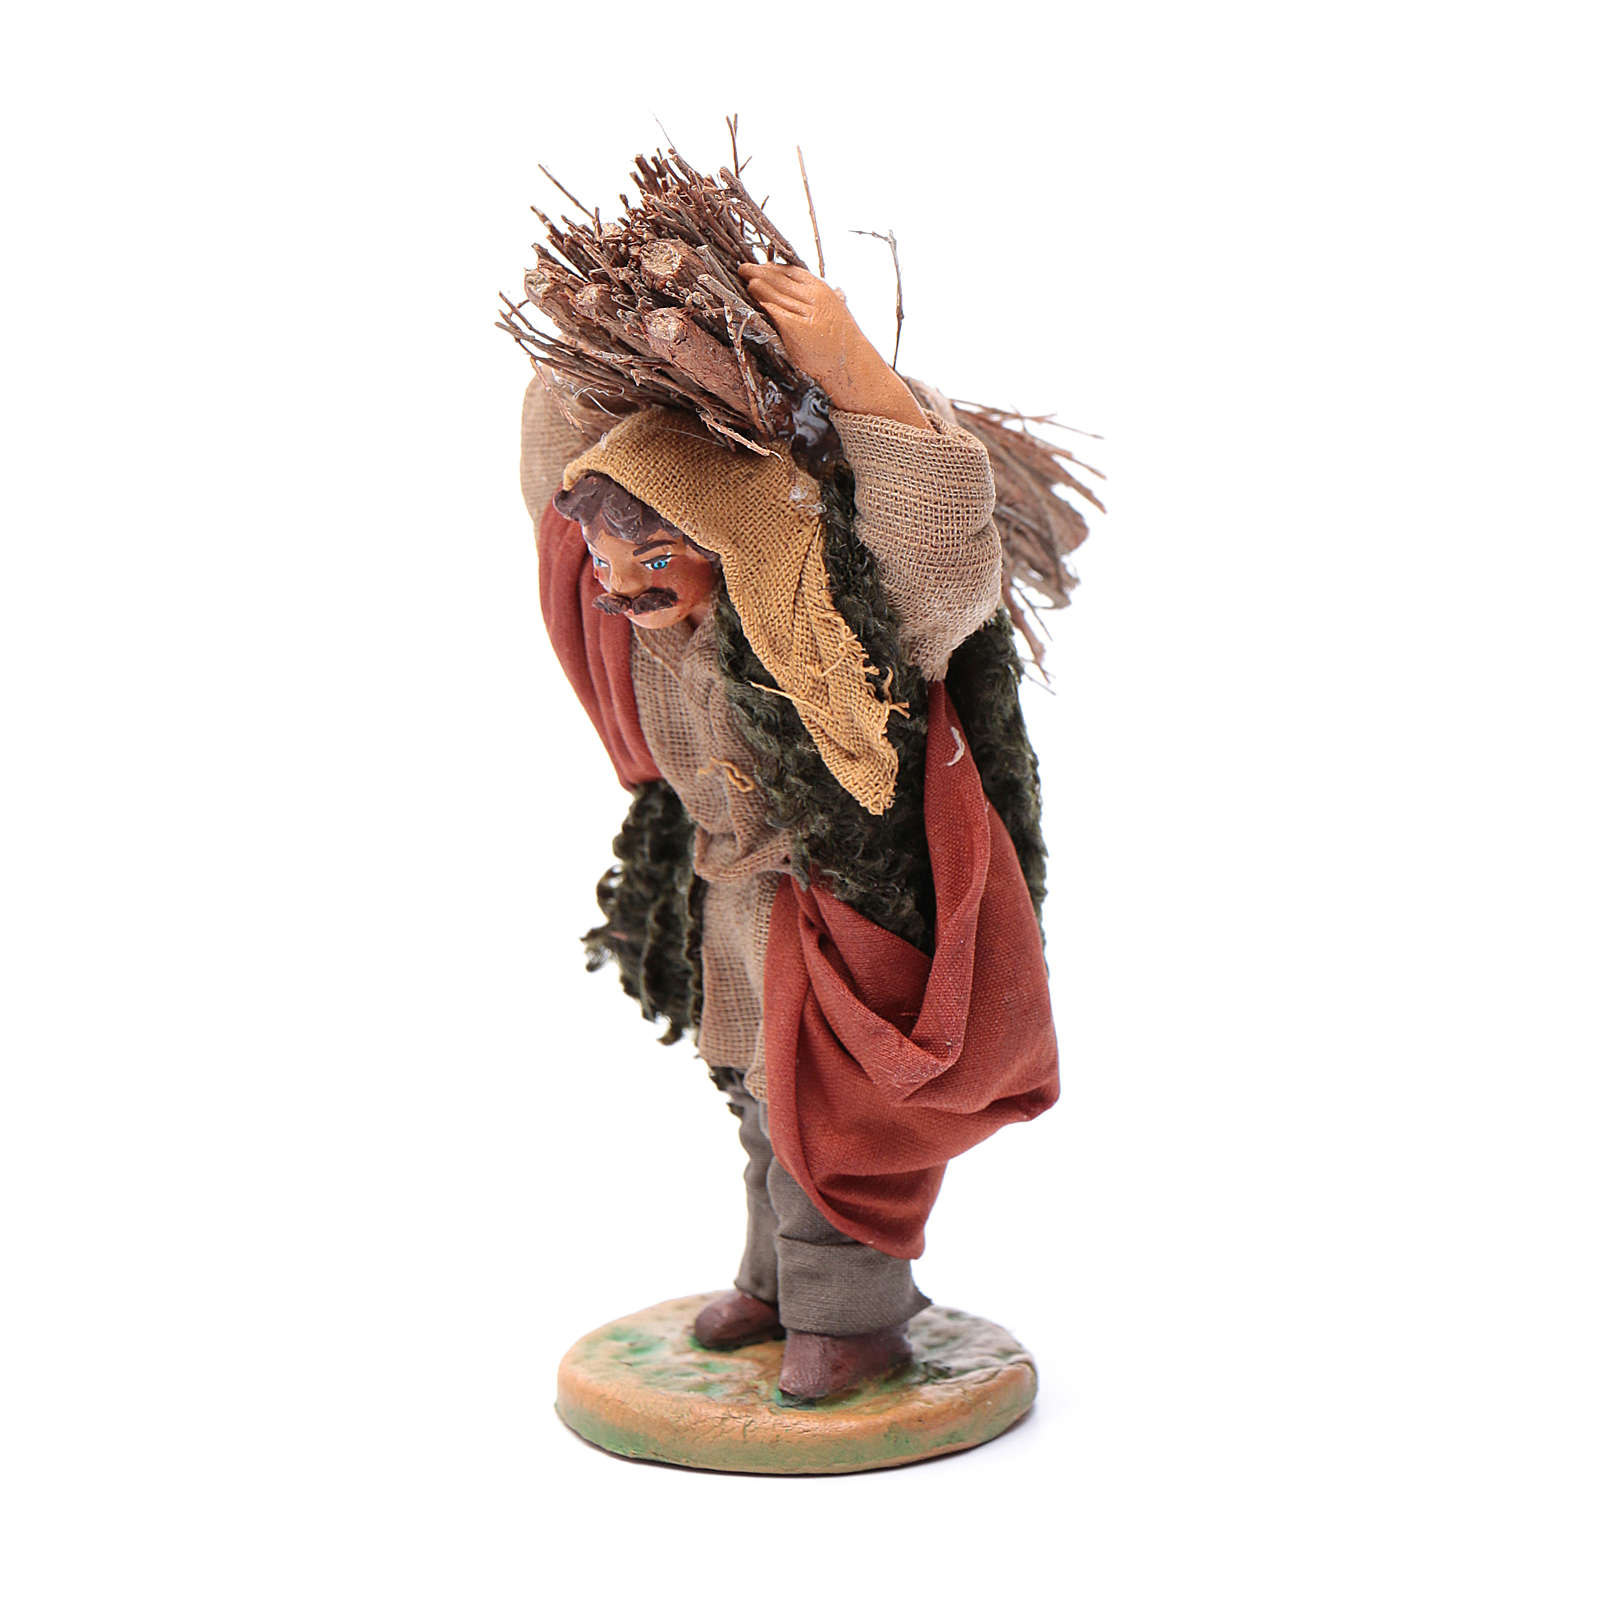 Neapolitan nativity scene statue woodcutter 10 cm 4